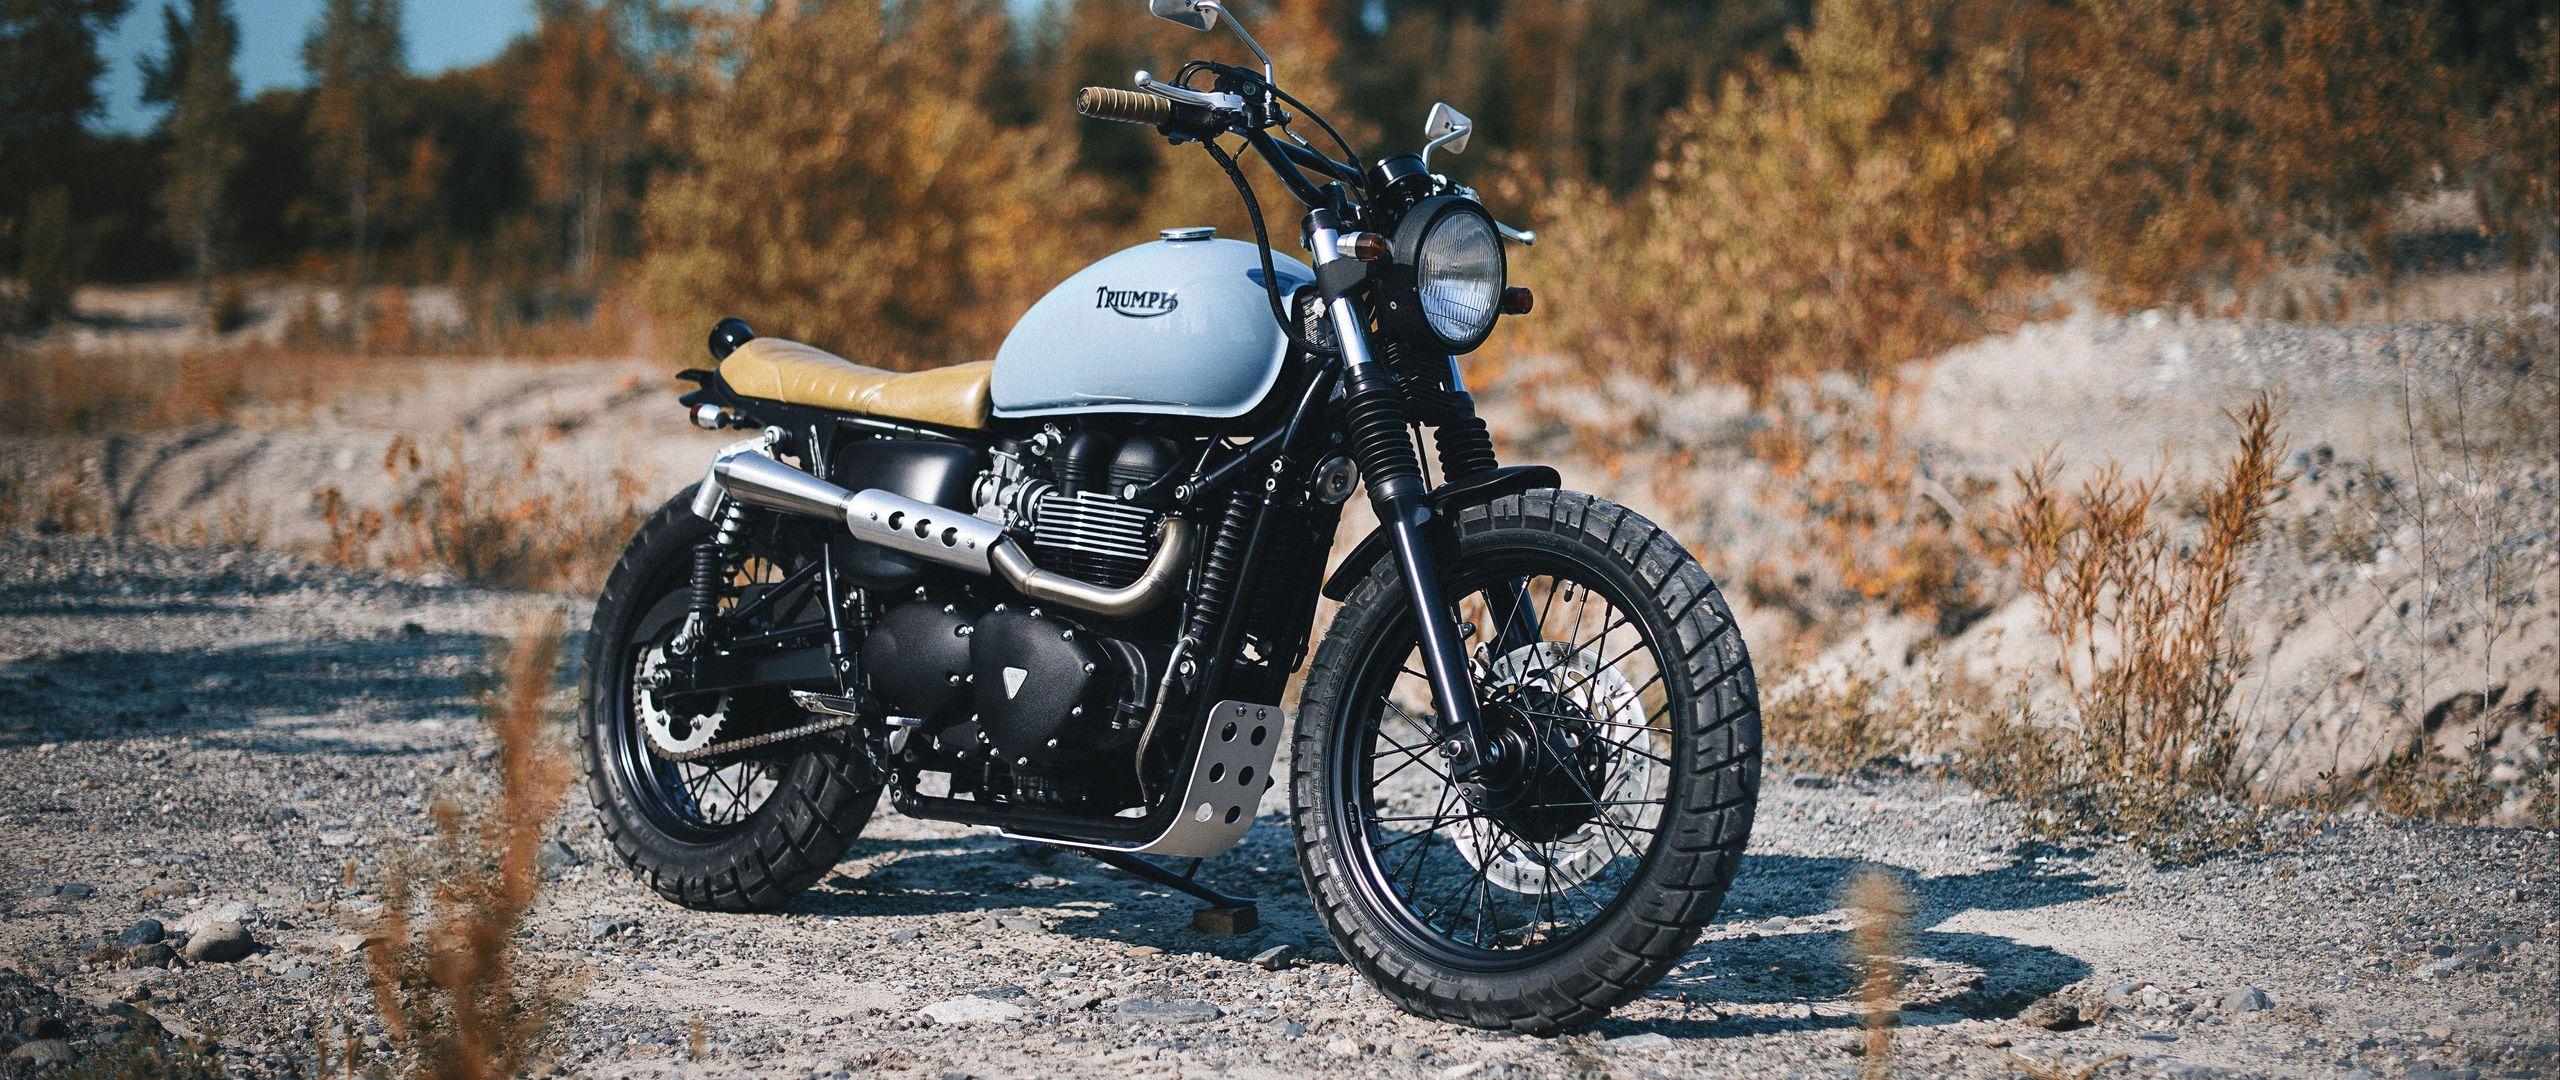 2560x1080 Обои triumph, bonneville, мотоцикл, вид сбоку